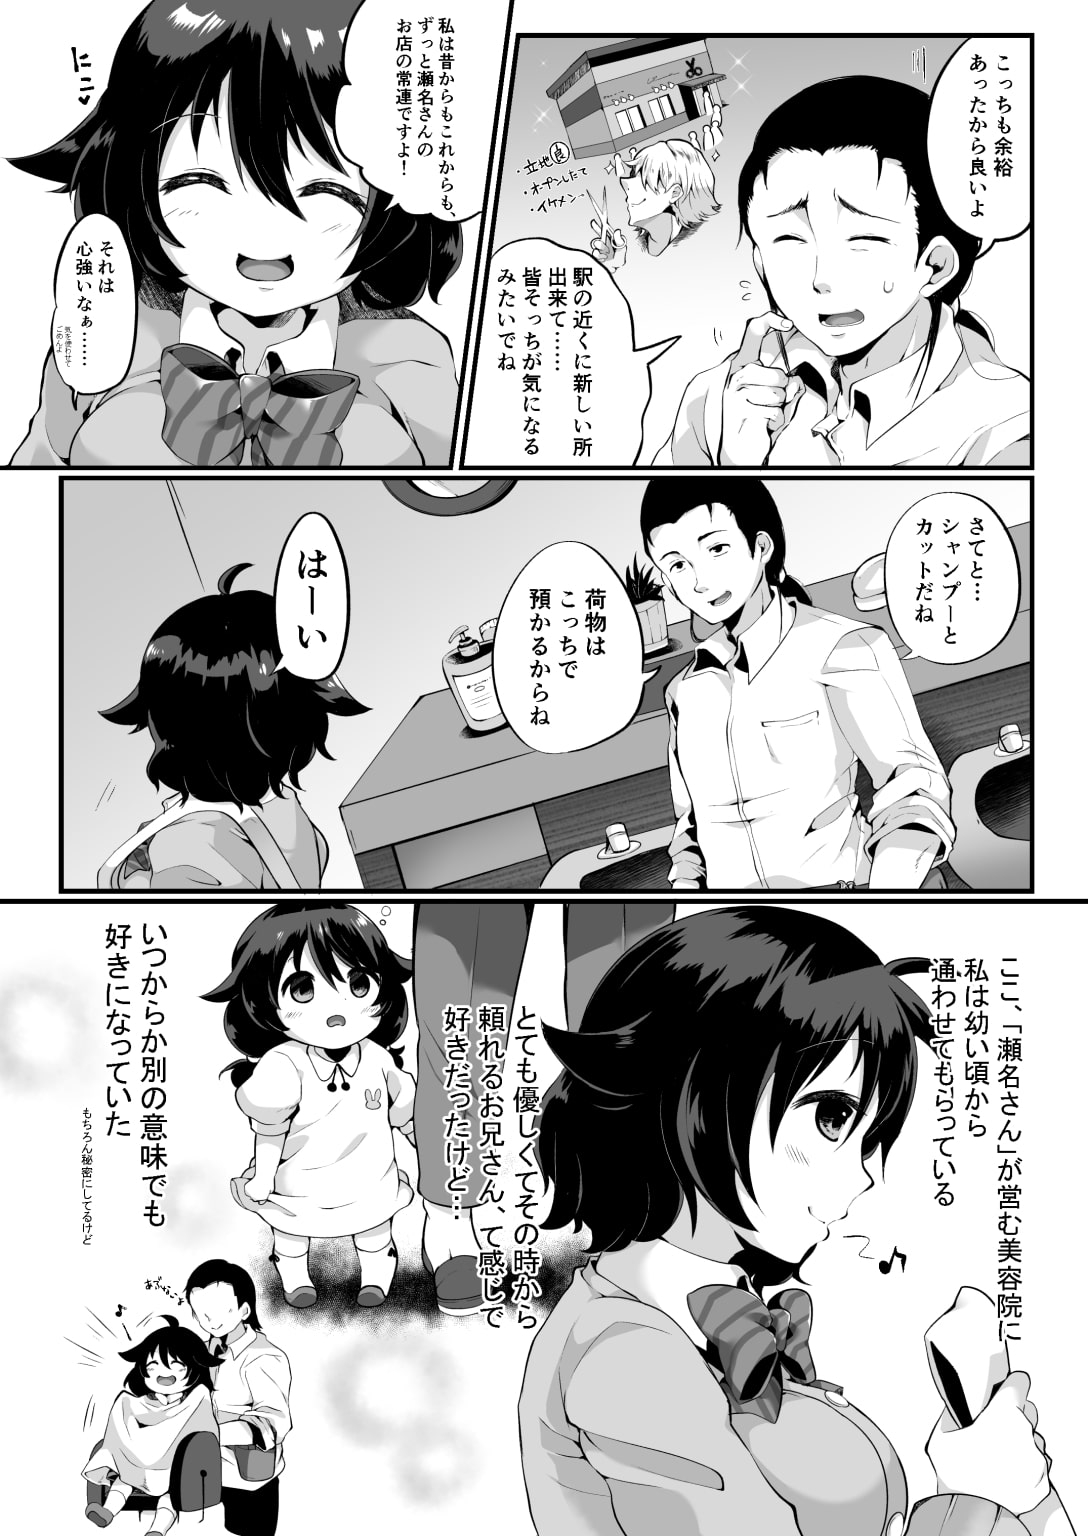 RJ329716 素朴で変態甘音ちゃん [20210611]